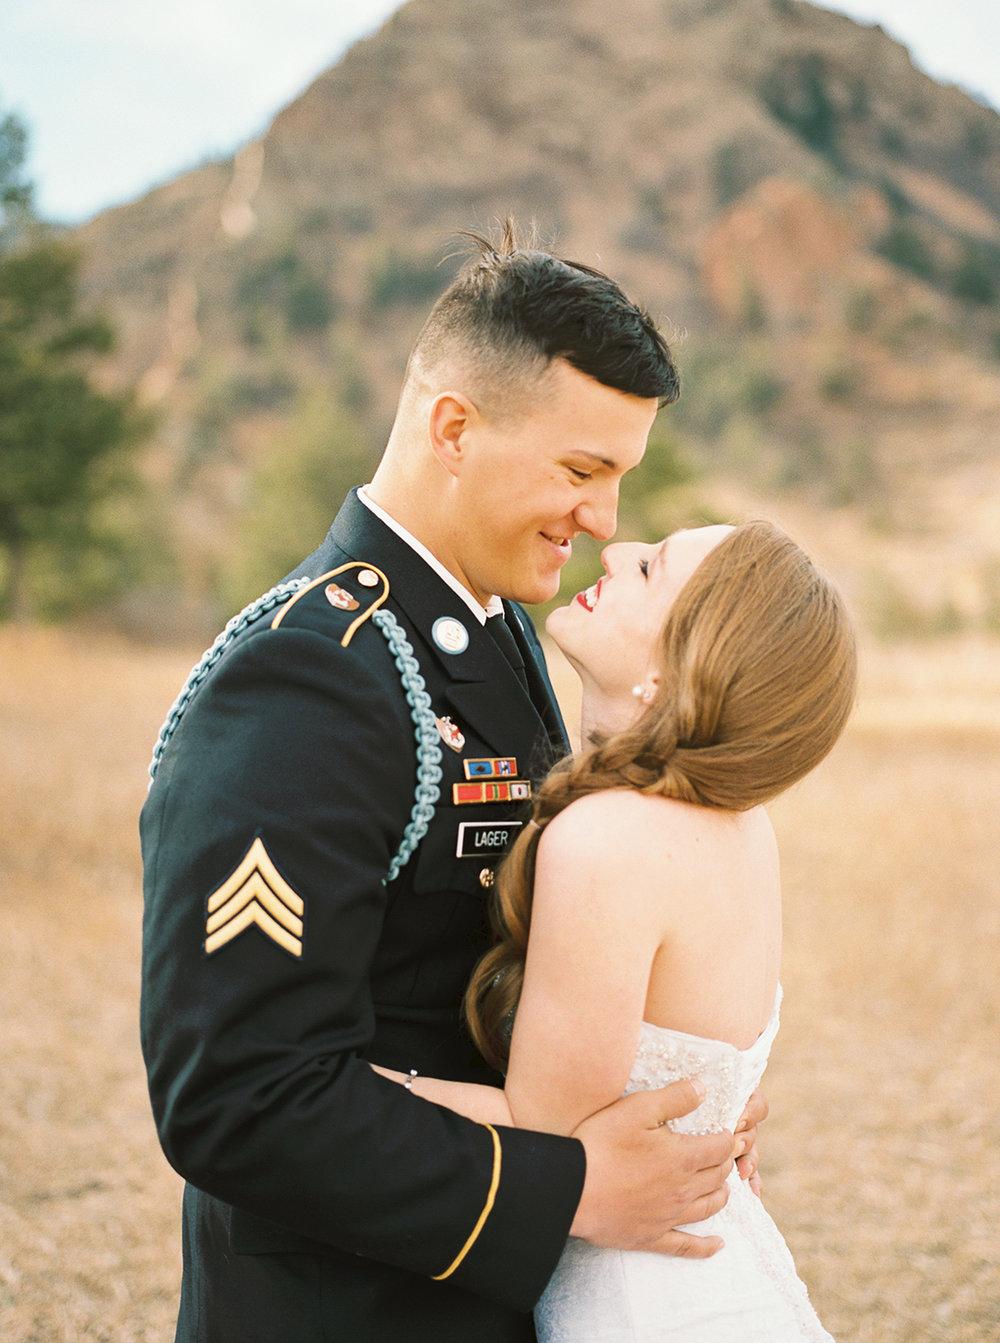 colorado-springs-military-wedding-skylar-rain-photography-j-d-12.jpg